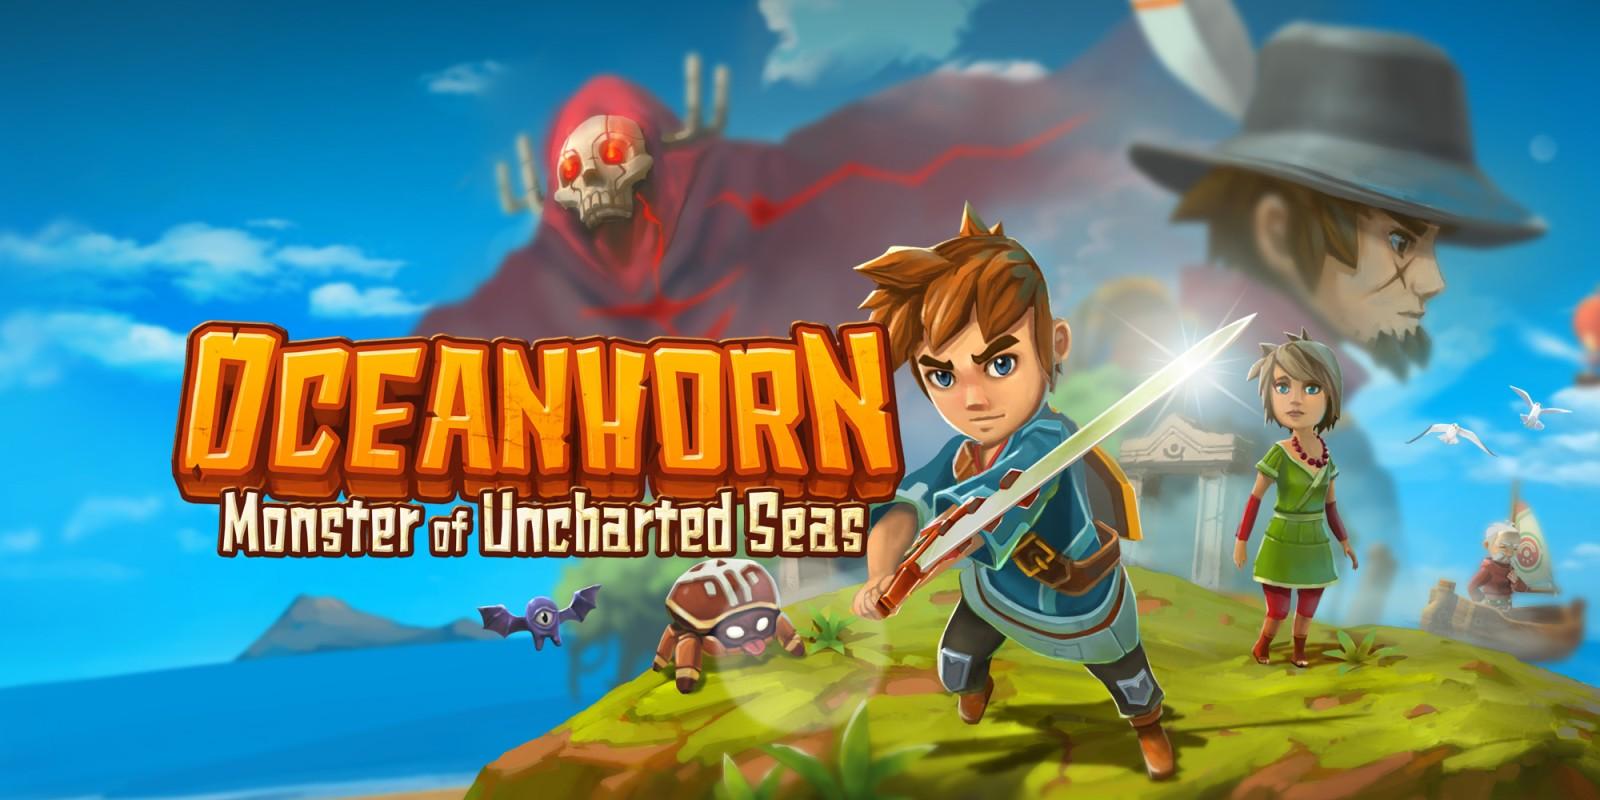 Inspired By Zelda: The Swashbuckling Spirit of Oceanhorn